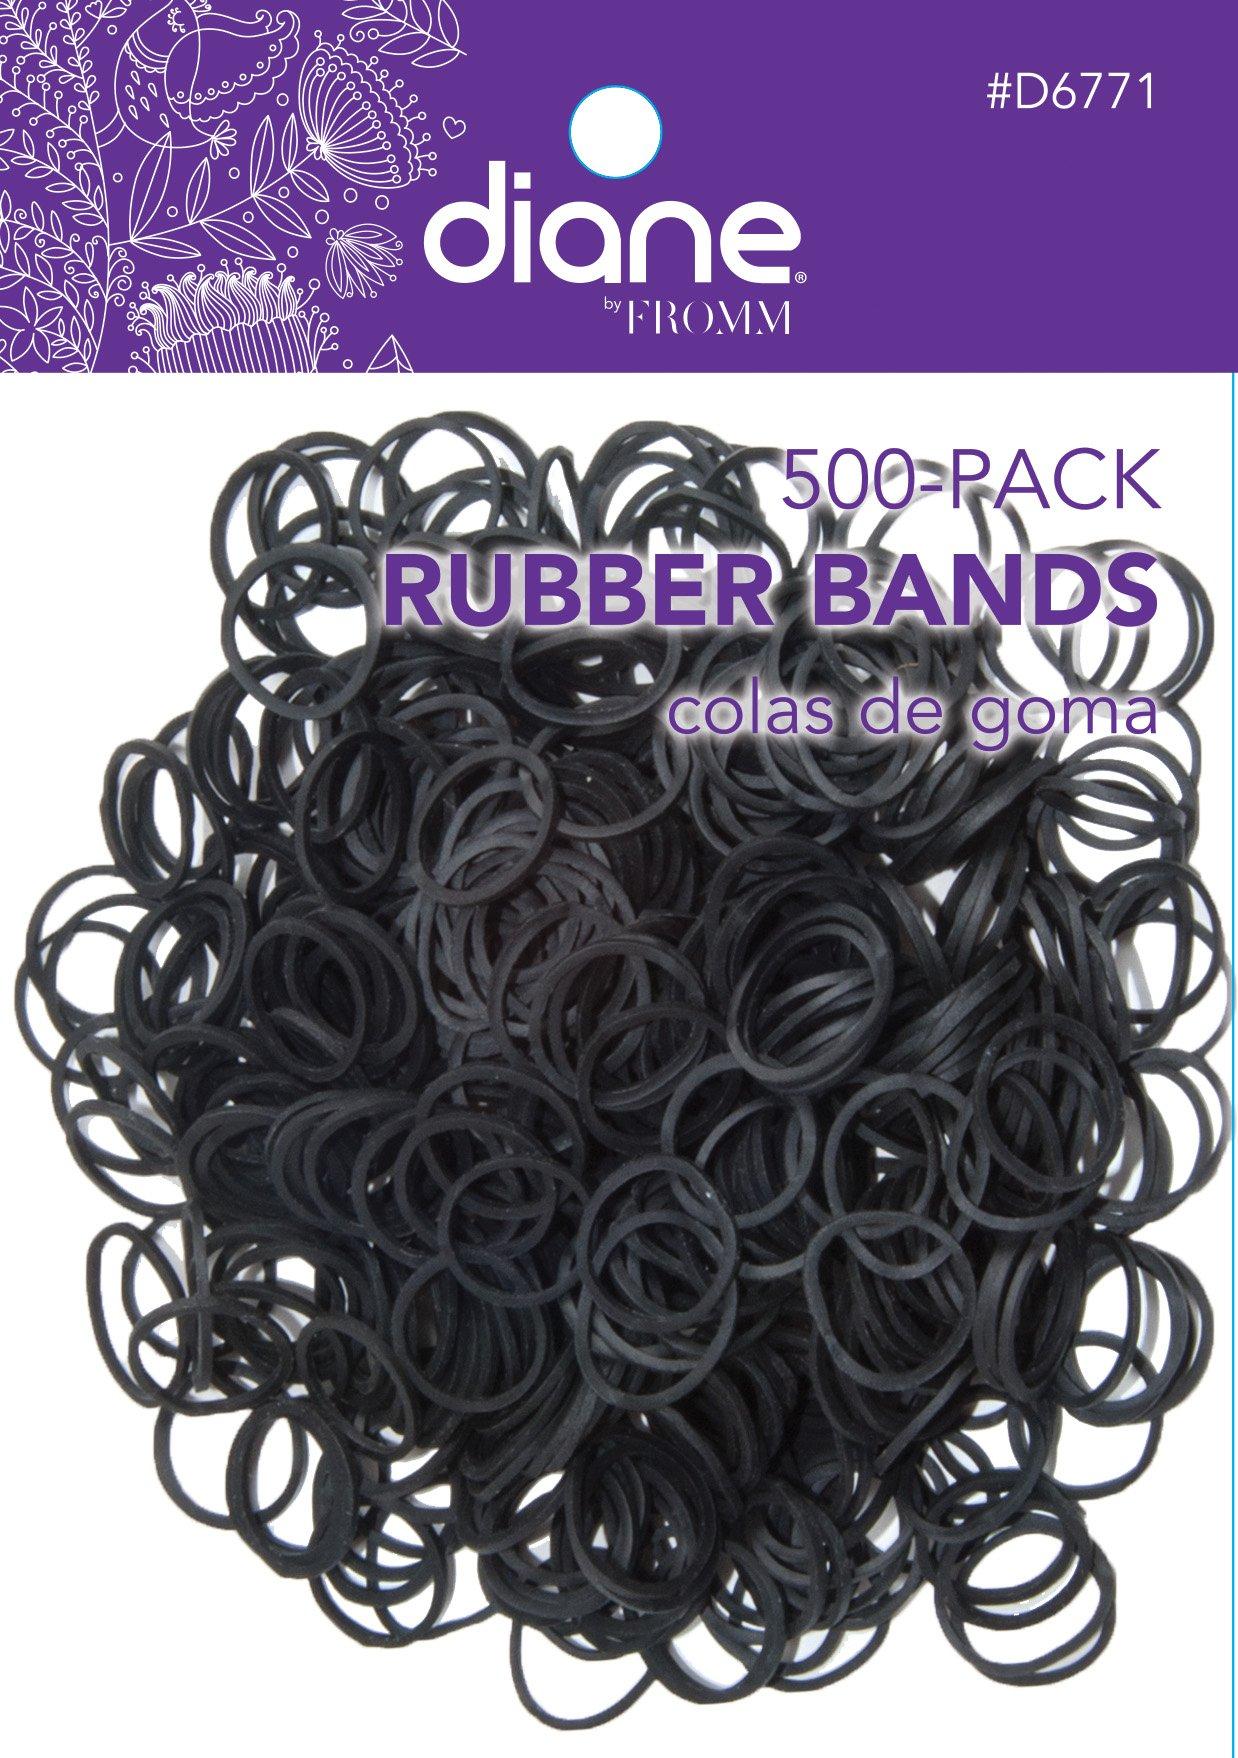 Diane Rubber Bands Black 500-Pack, 500-CT RUBBER BANDS BLACK, Soft elastic bands will not break hair